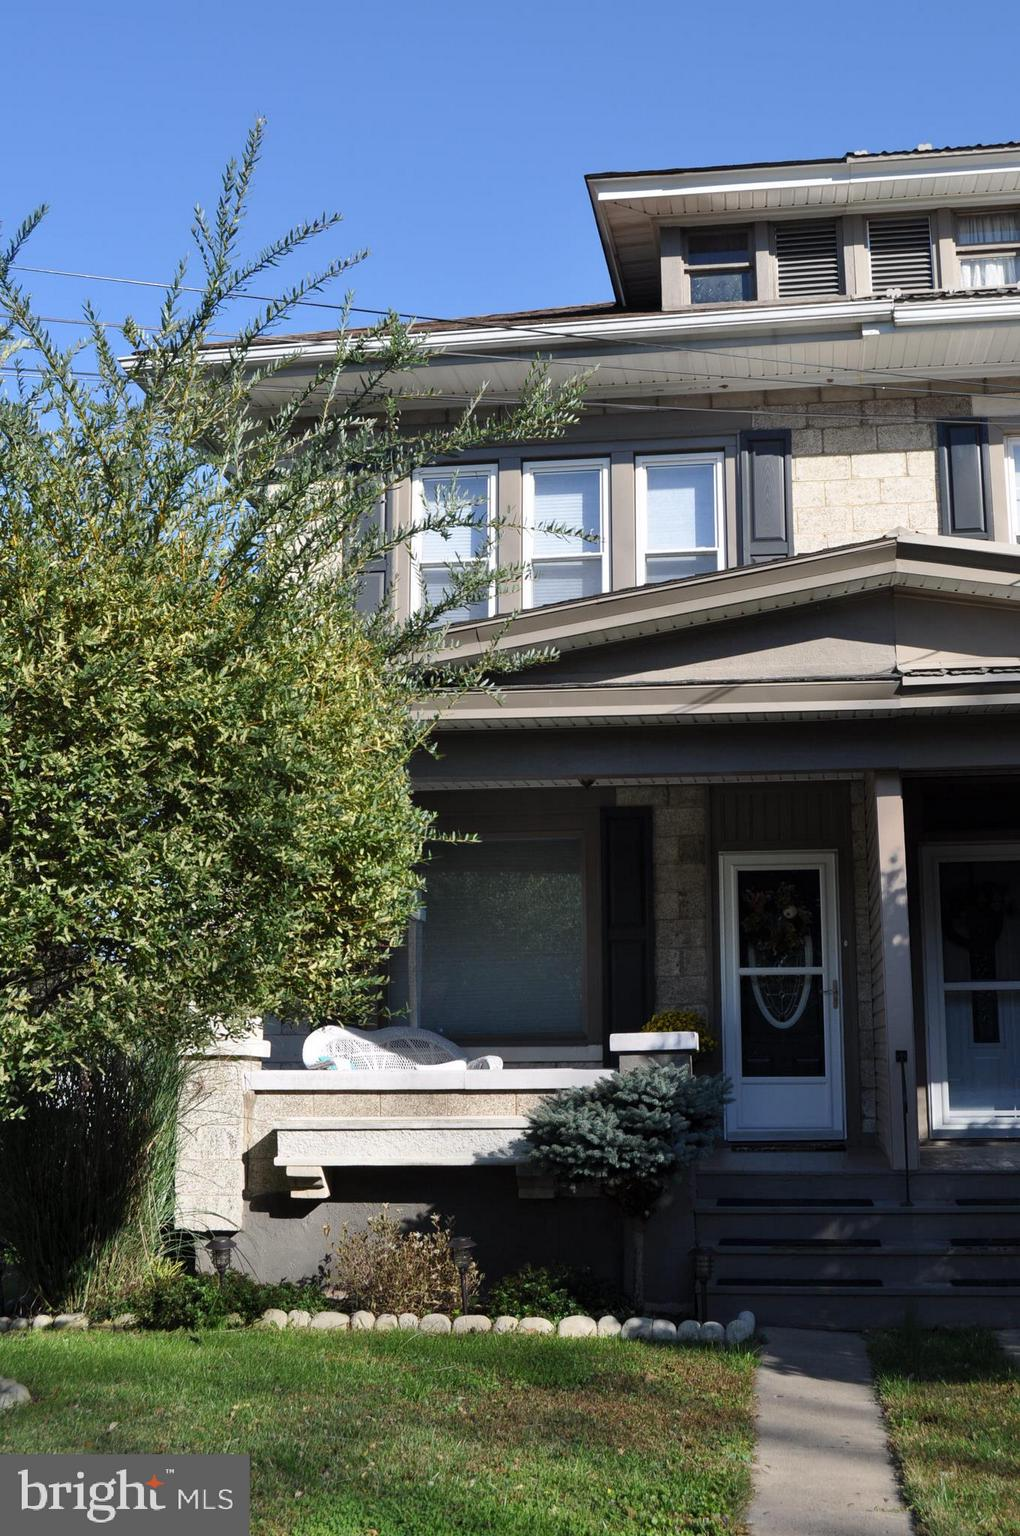 519 PINE STREET, MILLERSBURG, PA 17061